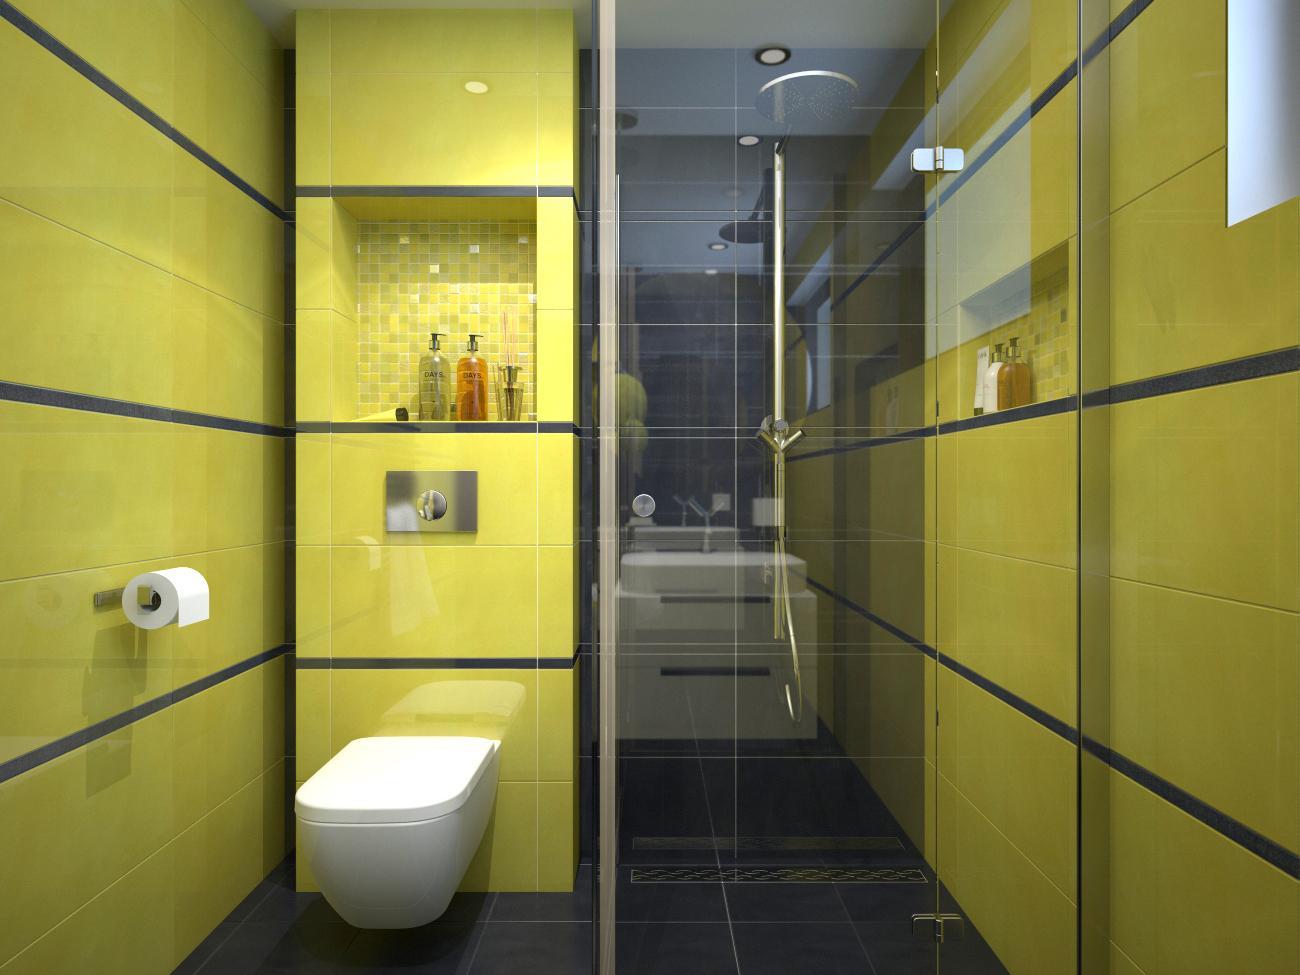 Vizualizácie kúpeľne - LIME & STEEL 30,5x56  - www.modernekupelne.sk/navrhy-kupelni